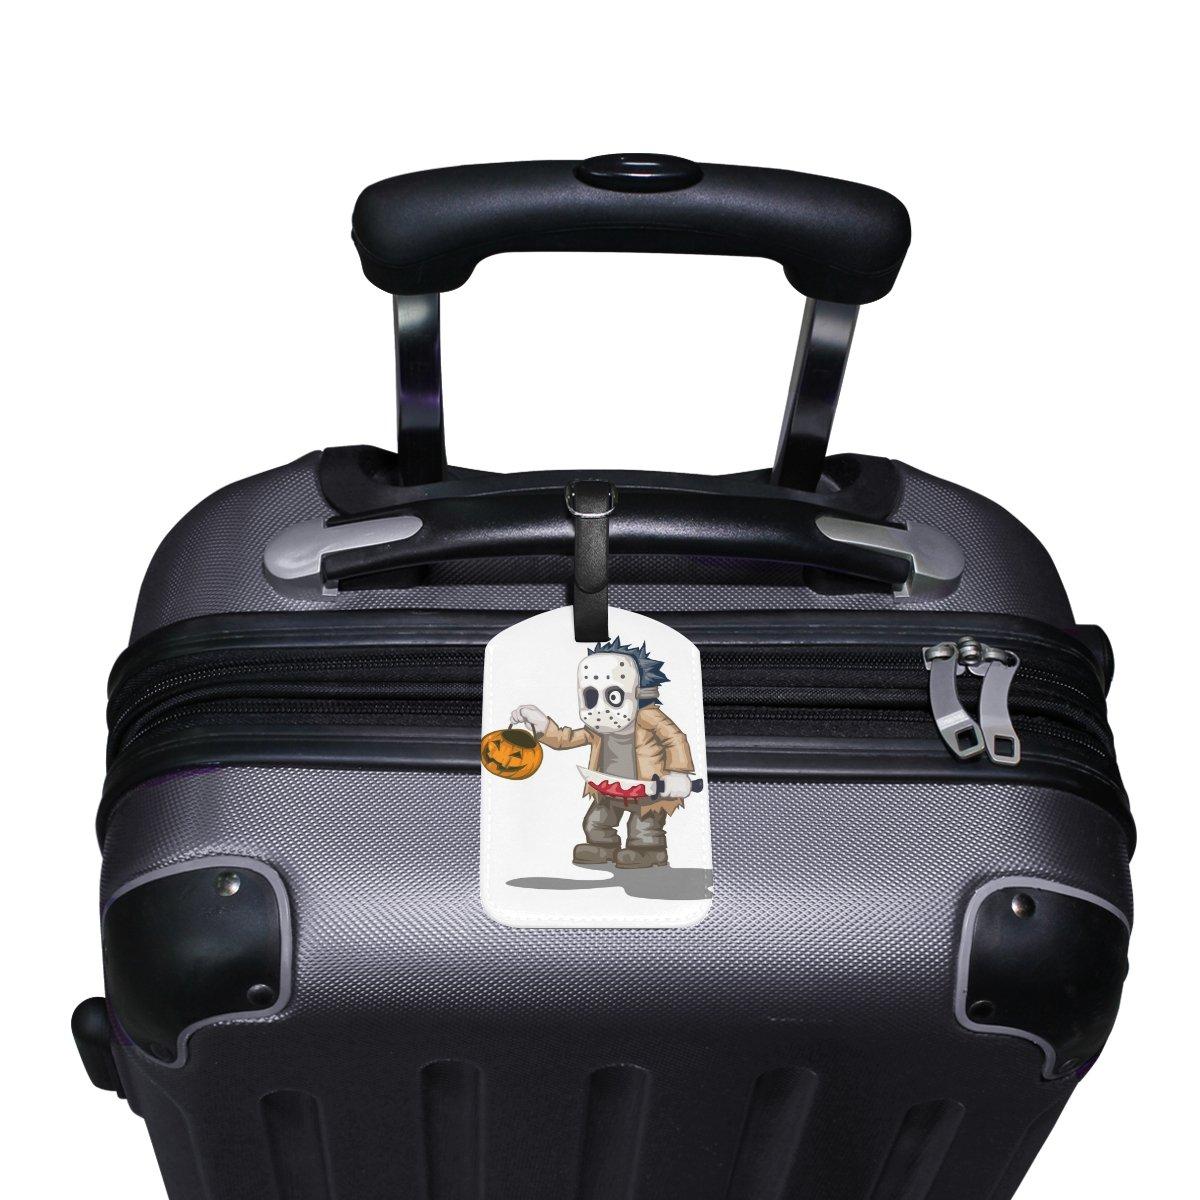 Saobao Travel Luggage Tag Skull And Dagger Pumpkin PU Leather Baggage Suitcase Travel ID Bag Tag 1Pcs